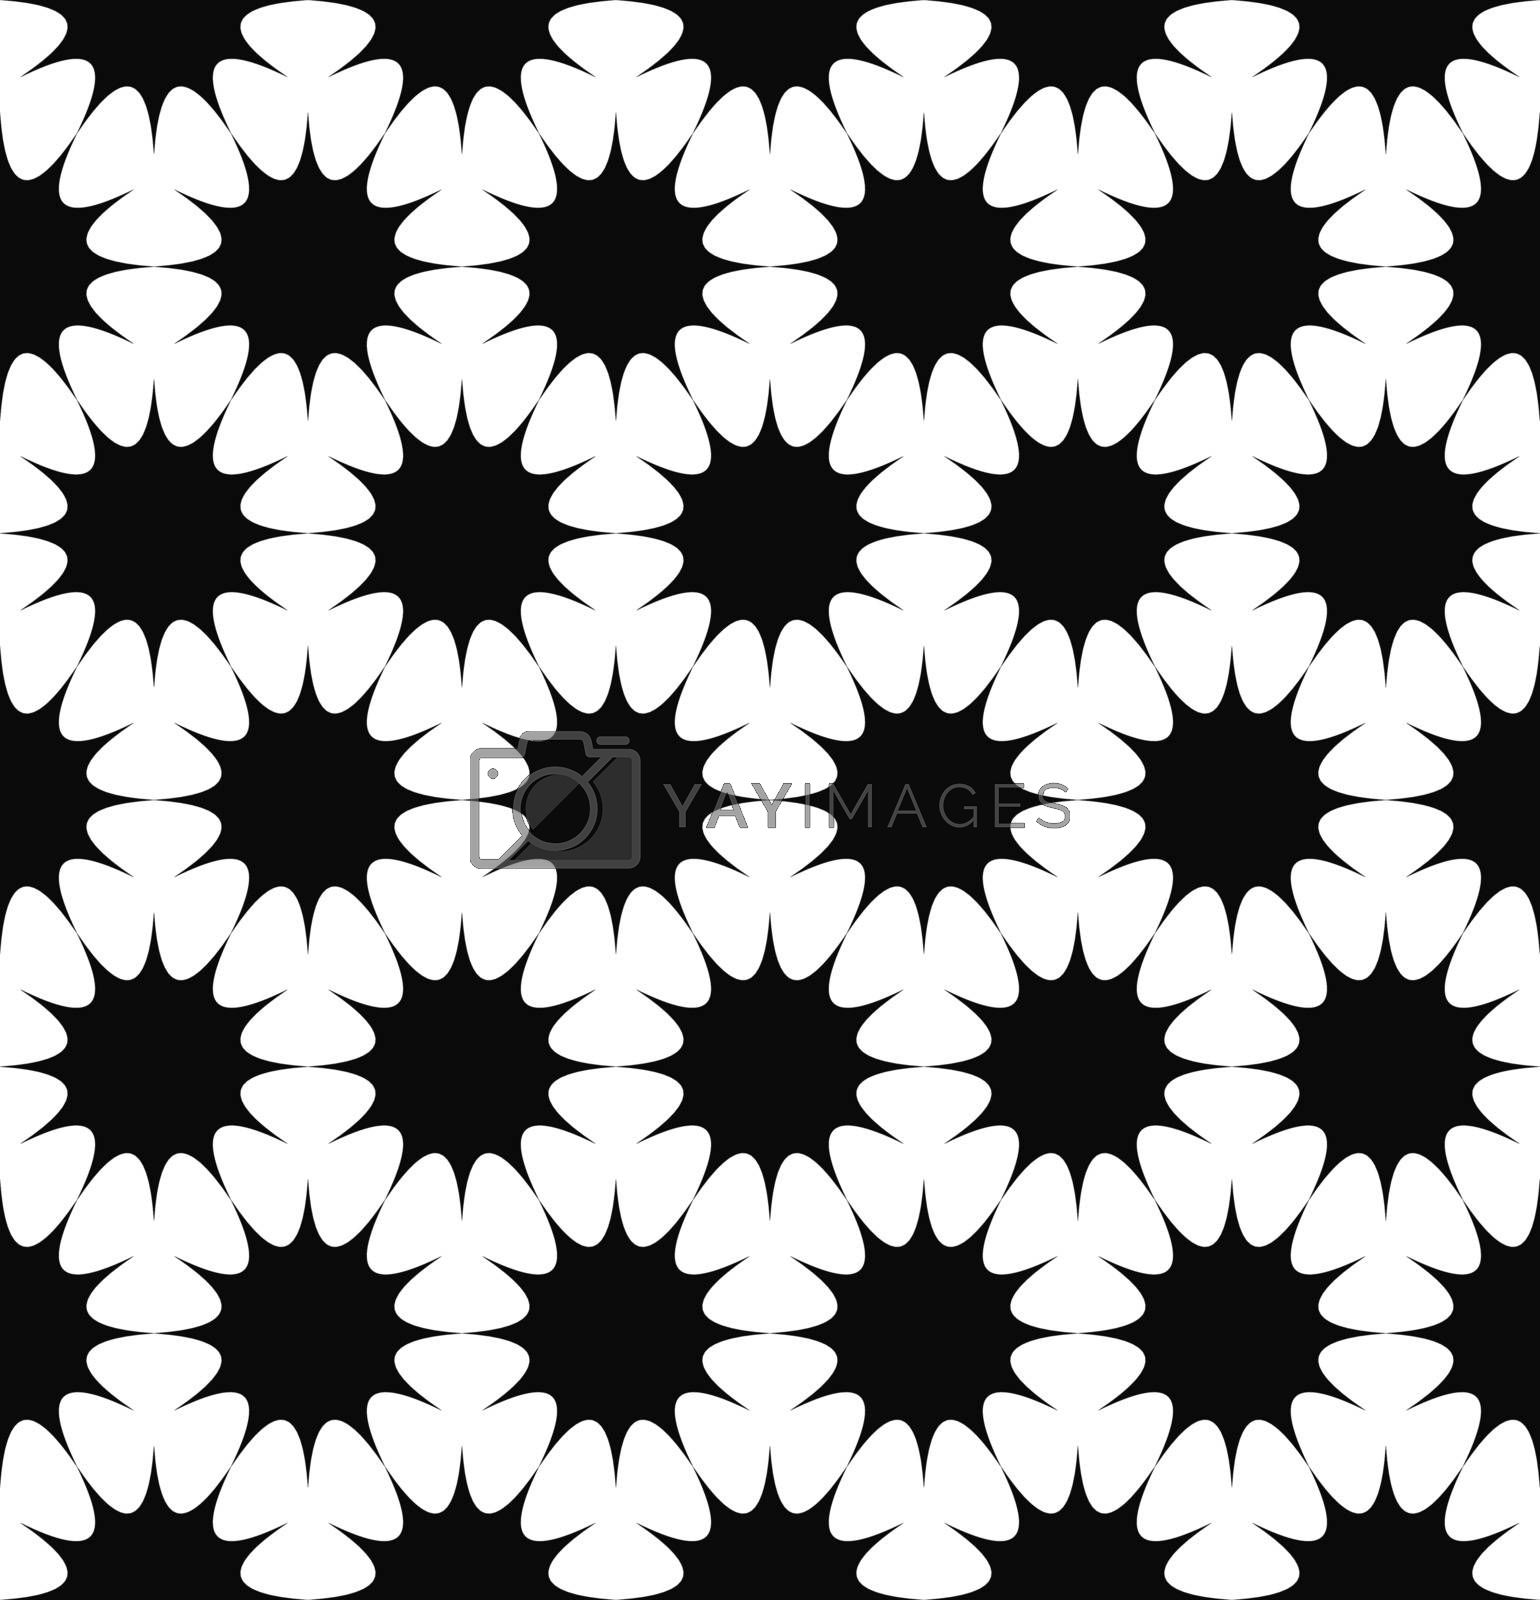 Repeating monochrome hexagonal vector star pattern design background